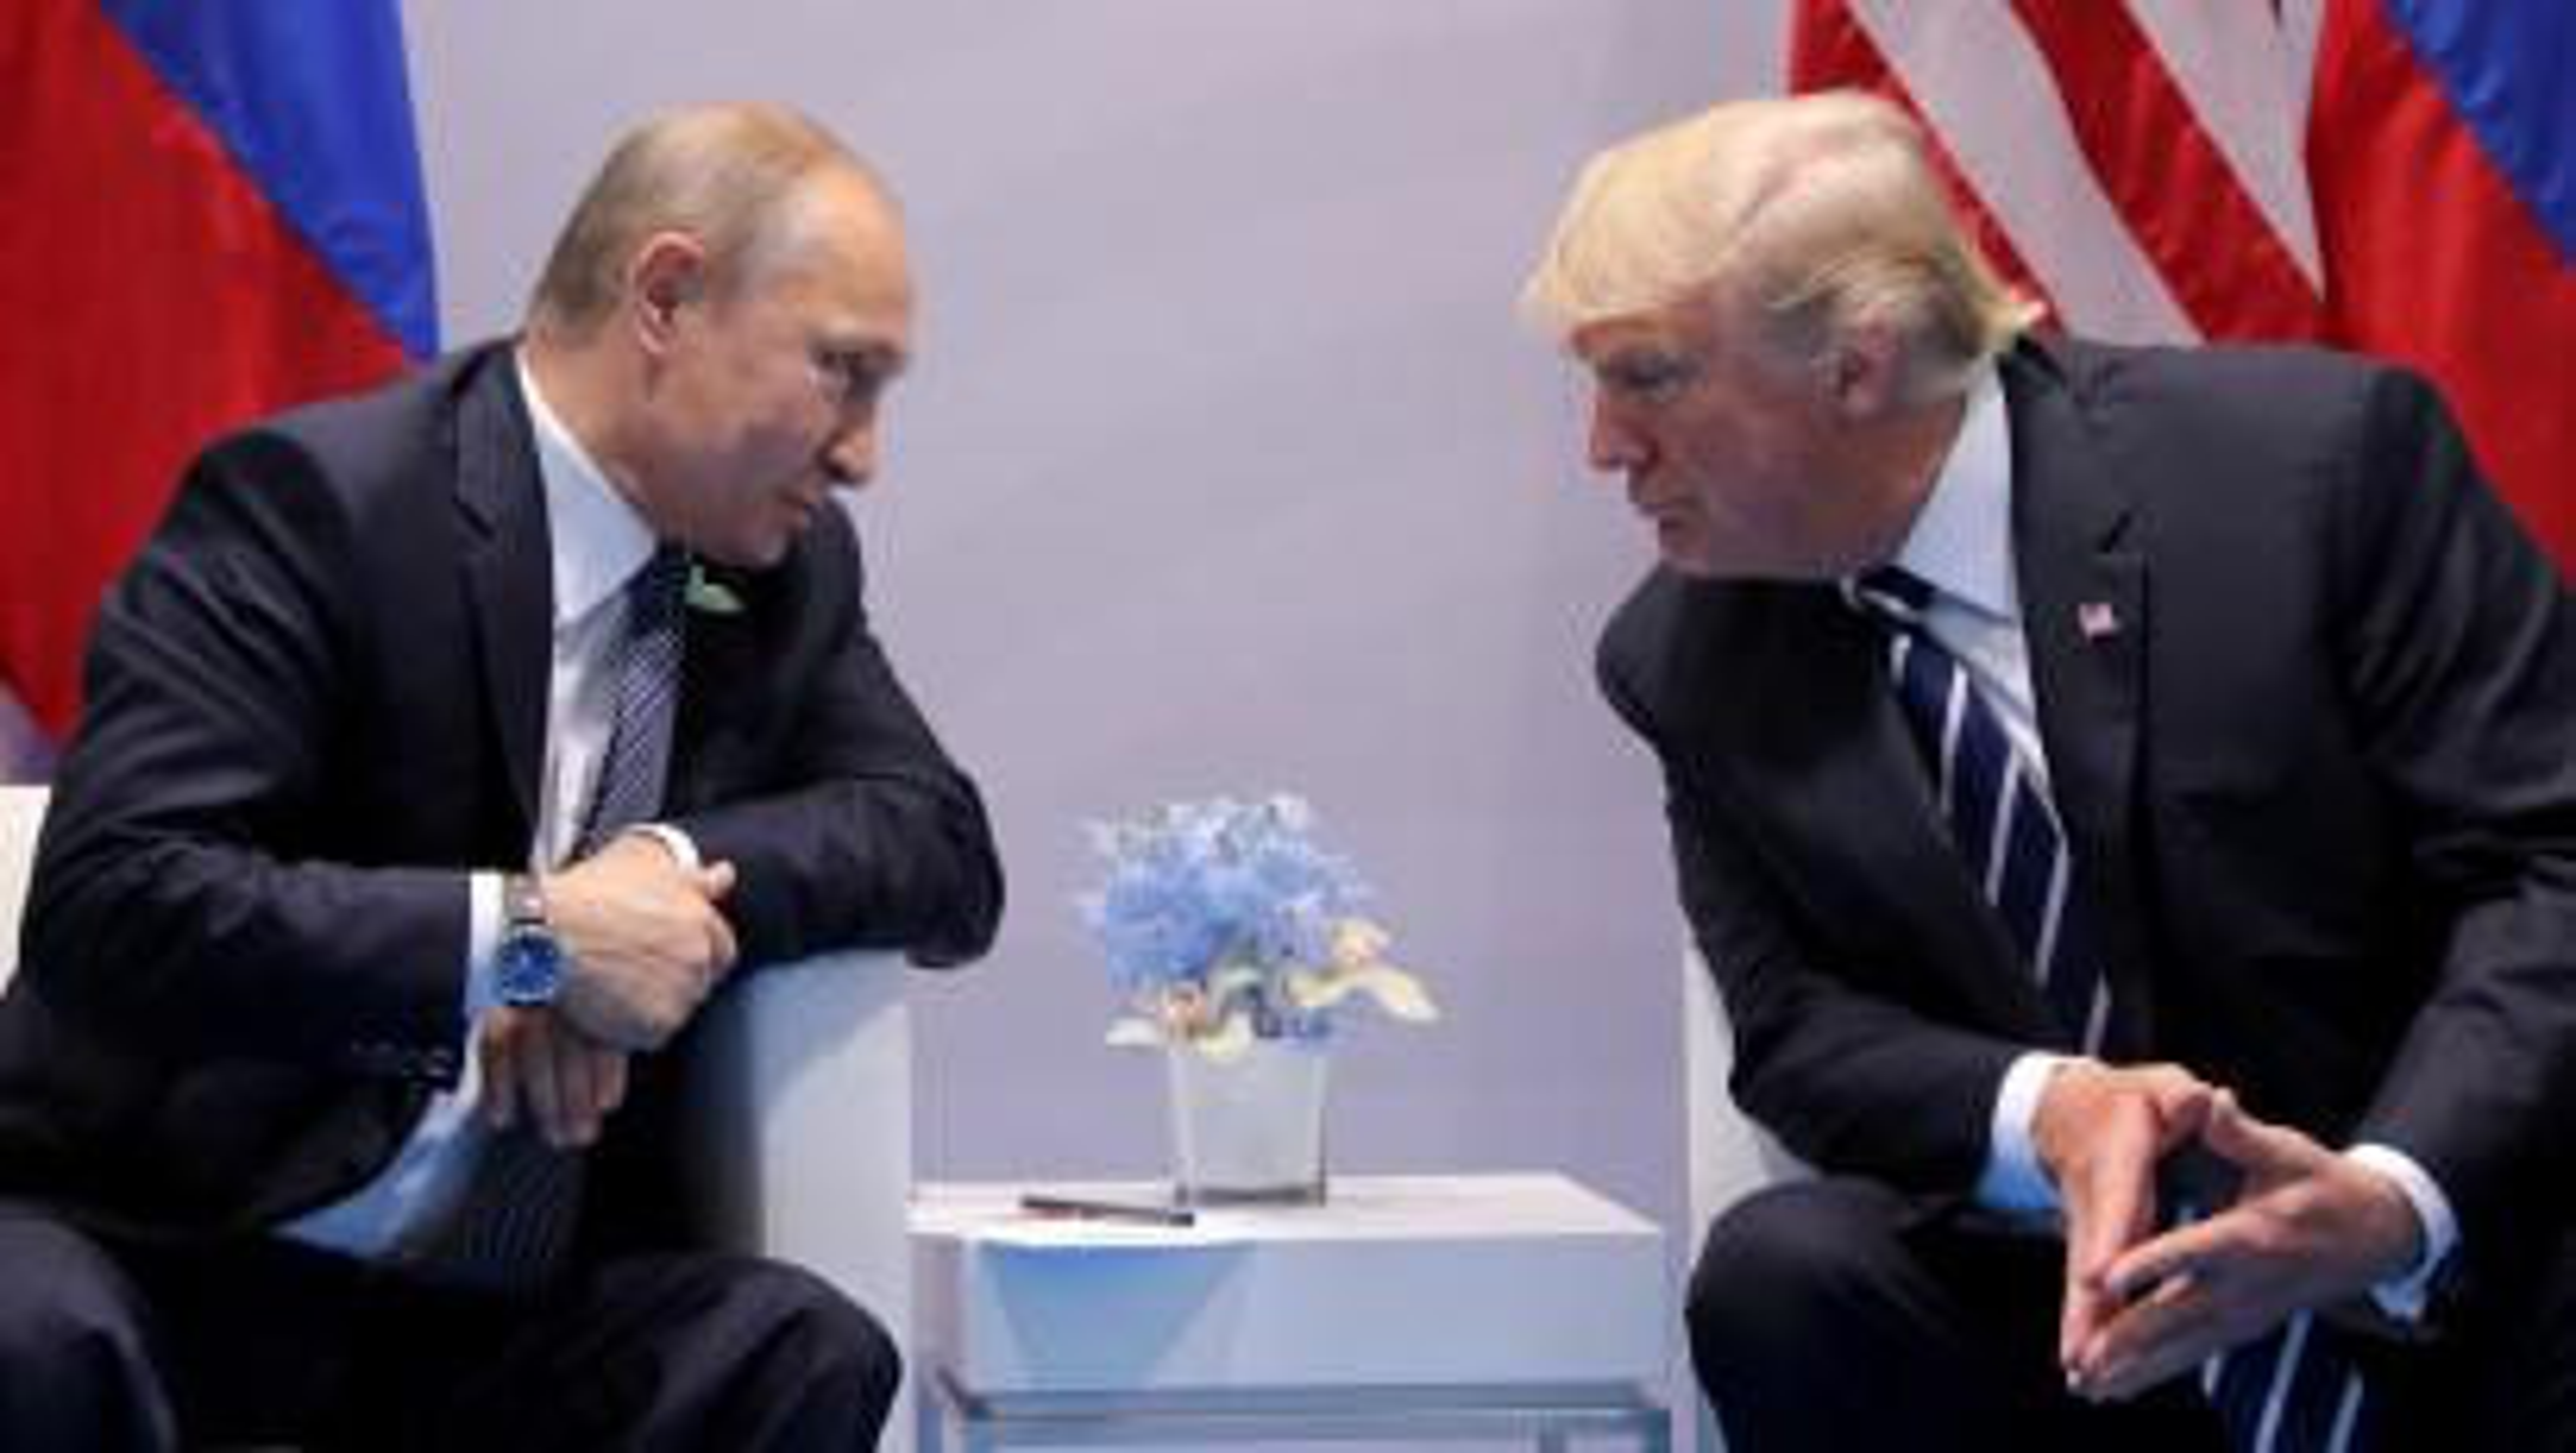 Russia's President Vladimir Putin and US President Donald Trump